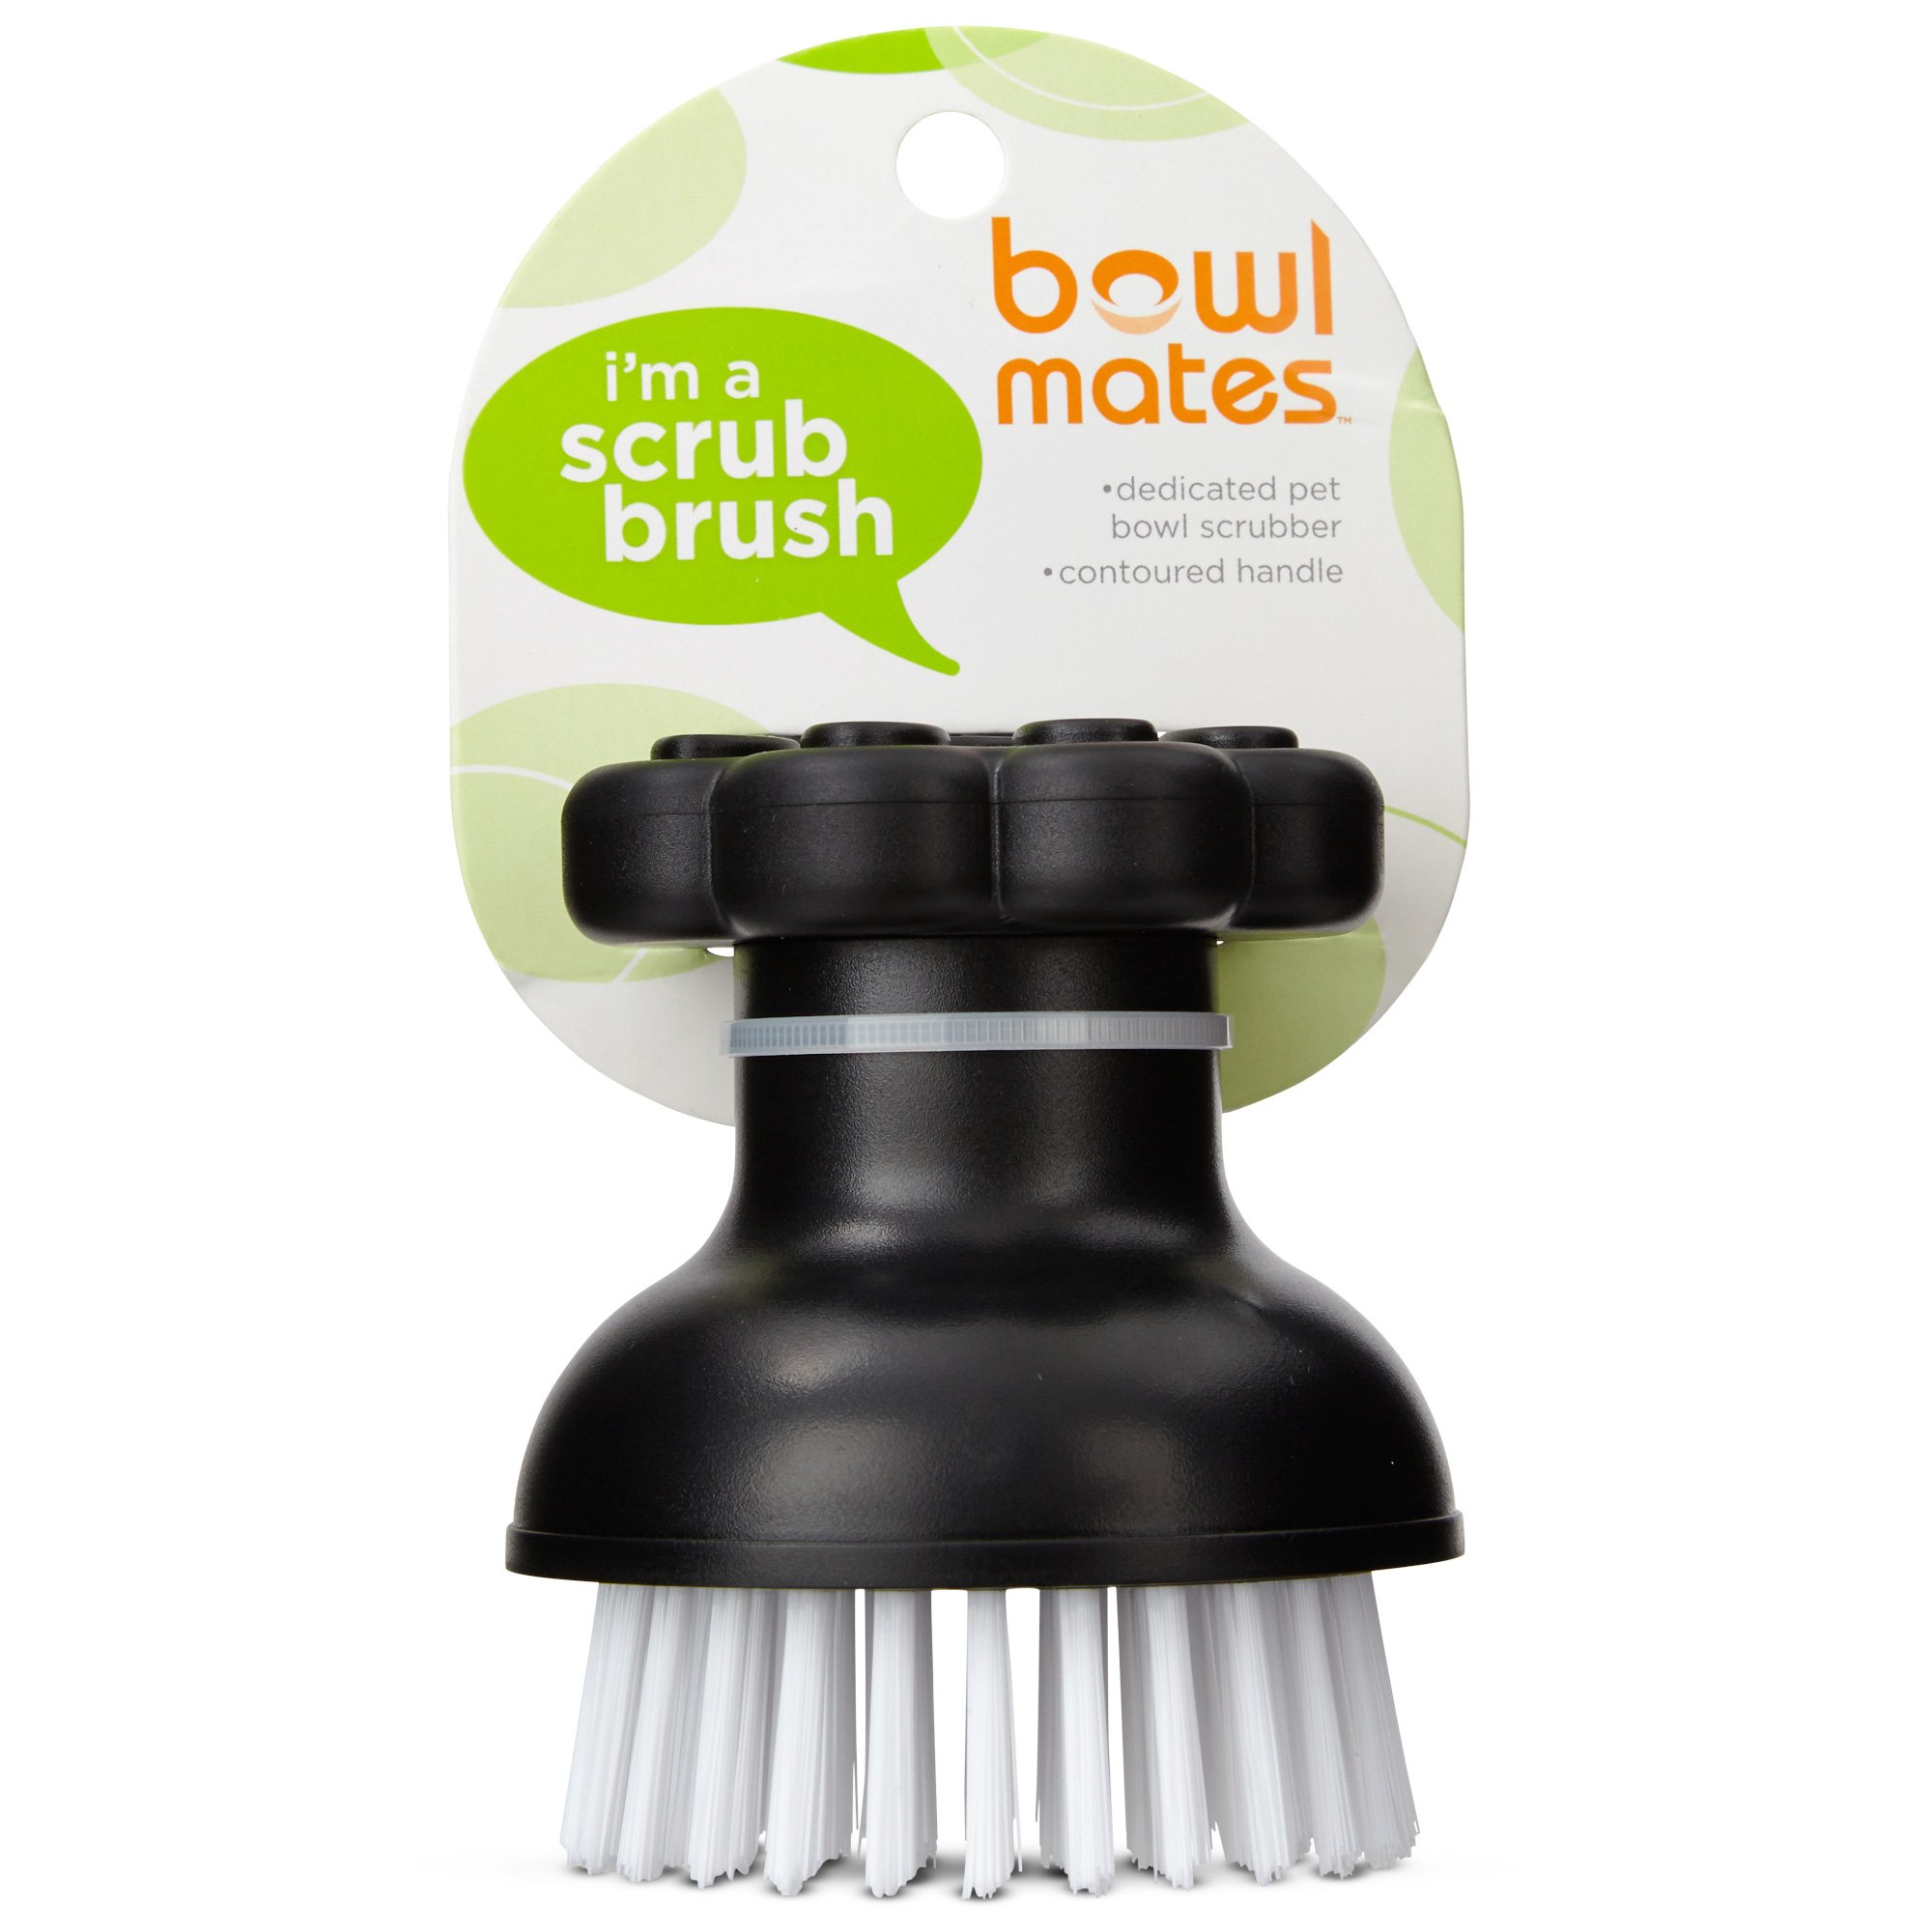 Image of Bowlmates Black Dog Bowl Scrub Brush, One Size Fits All